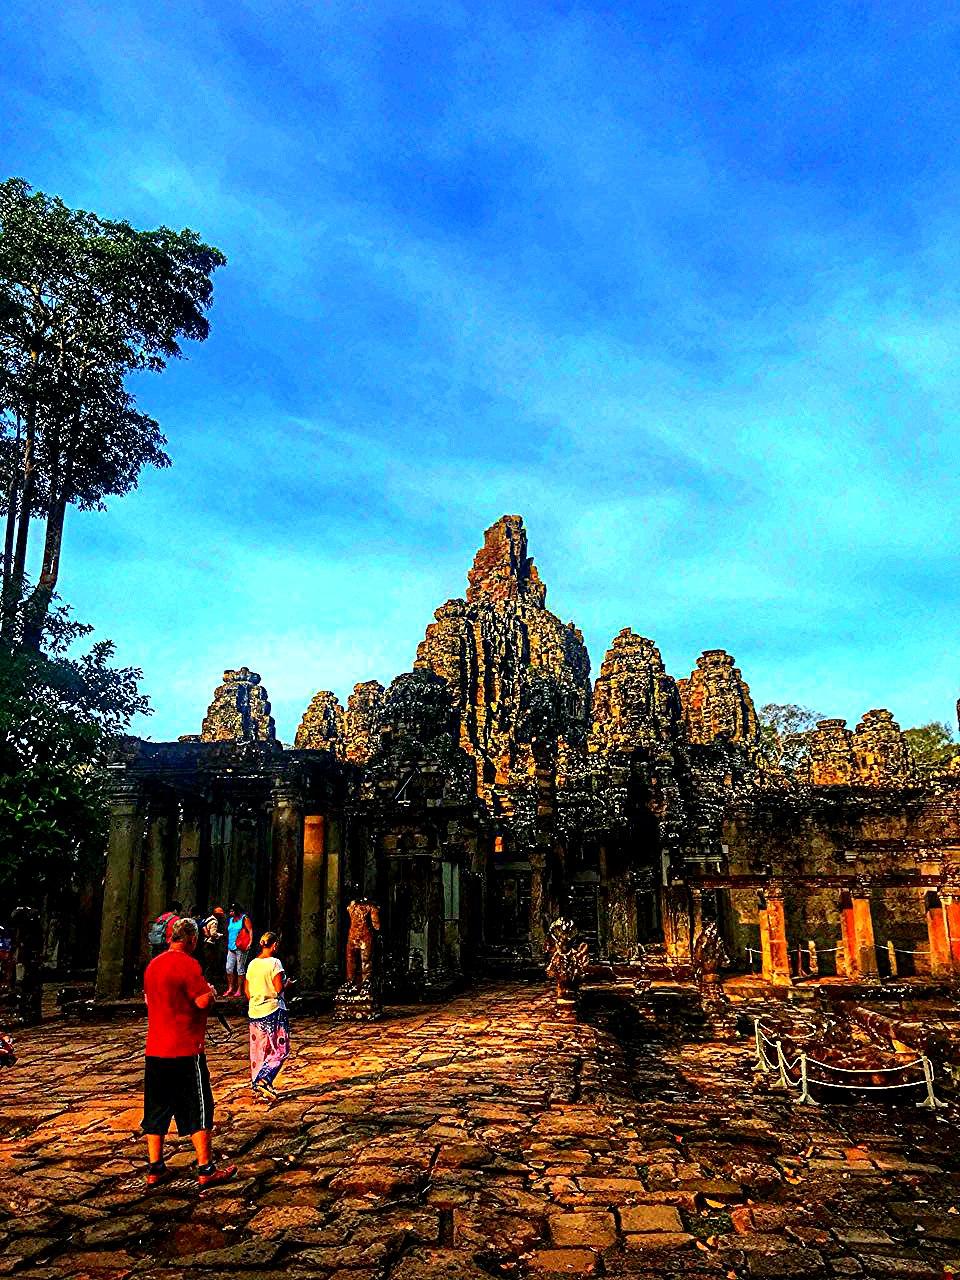 Елена Руденко (Валтея). Камбоджа. Ангкор. YxSCIklEWLs